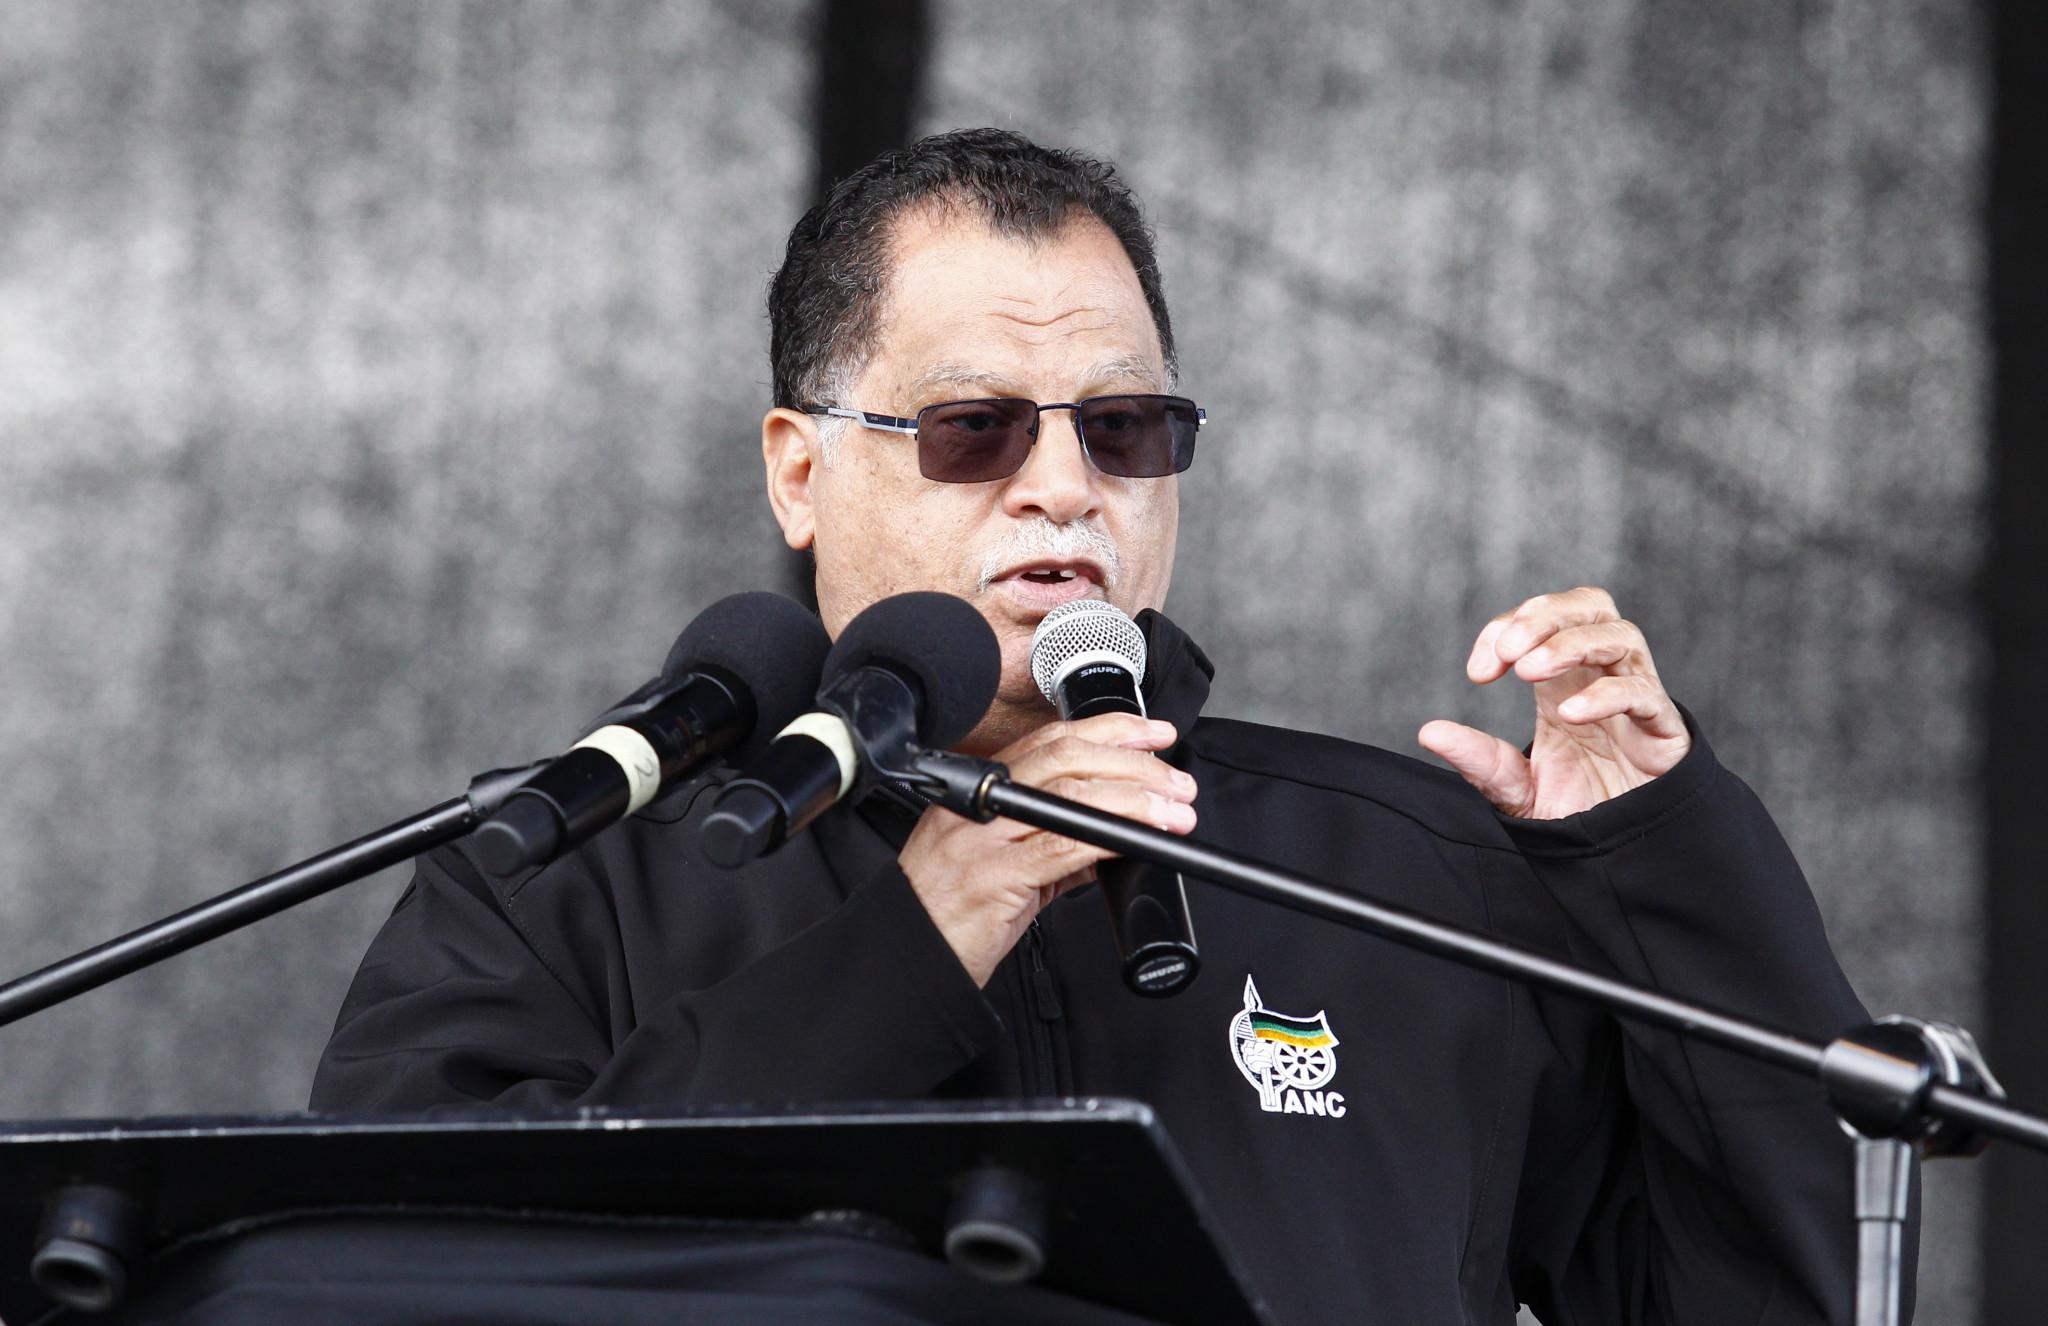 Specialist detective takes over investigation into SAFA President